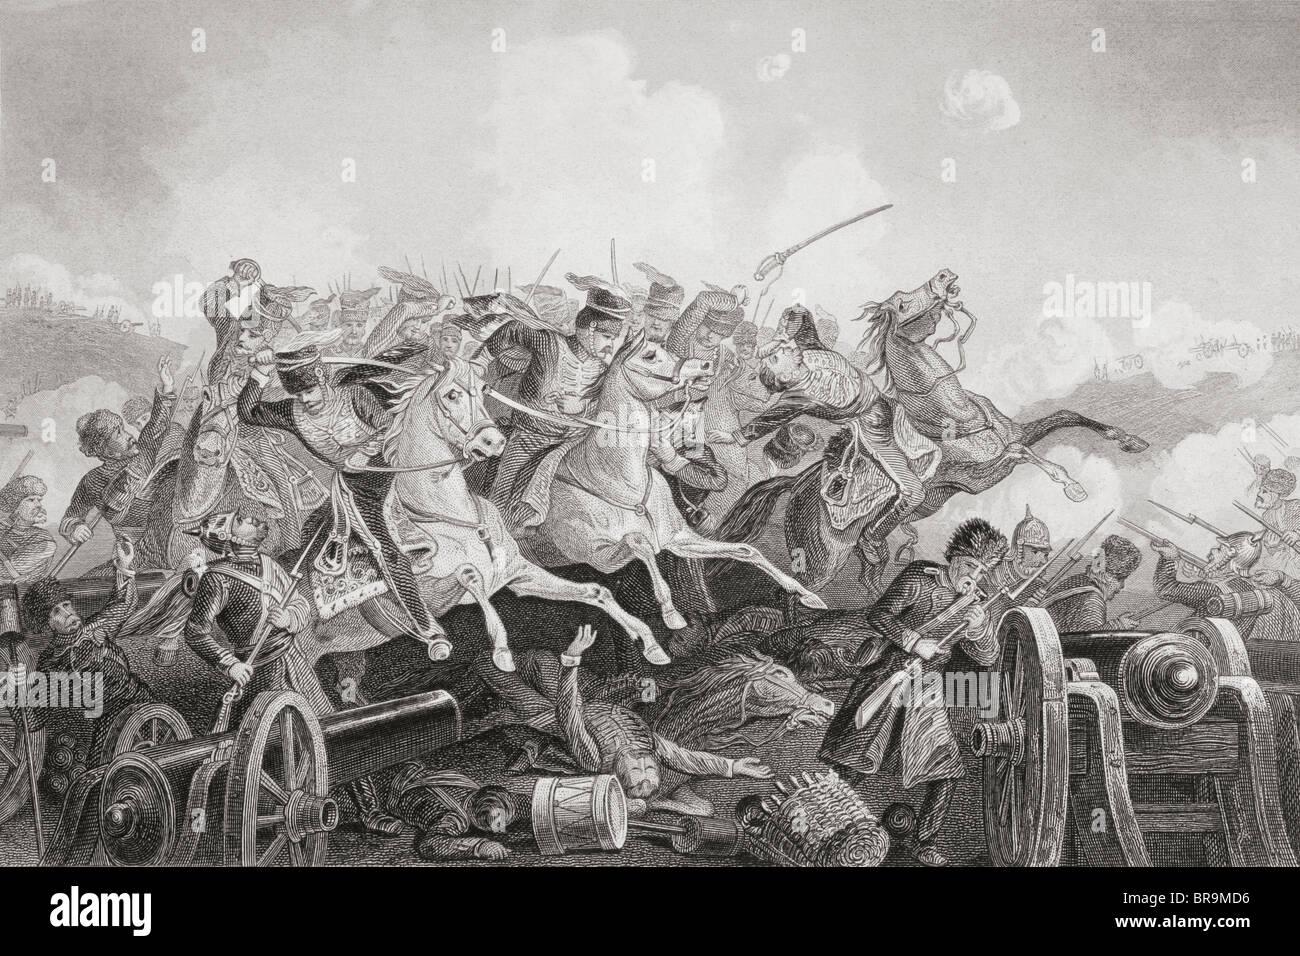 The Battle of Balaclava Haro Prii, Crimea, 25 October 1854.  Charge of the Light Brigade. - Stock Image